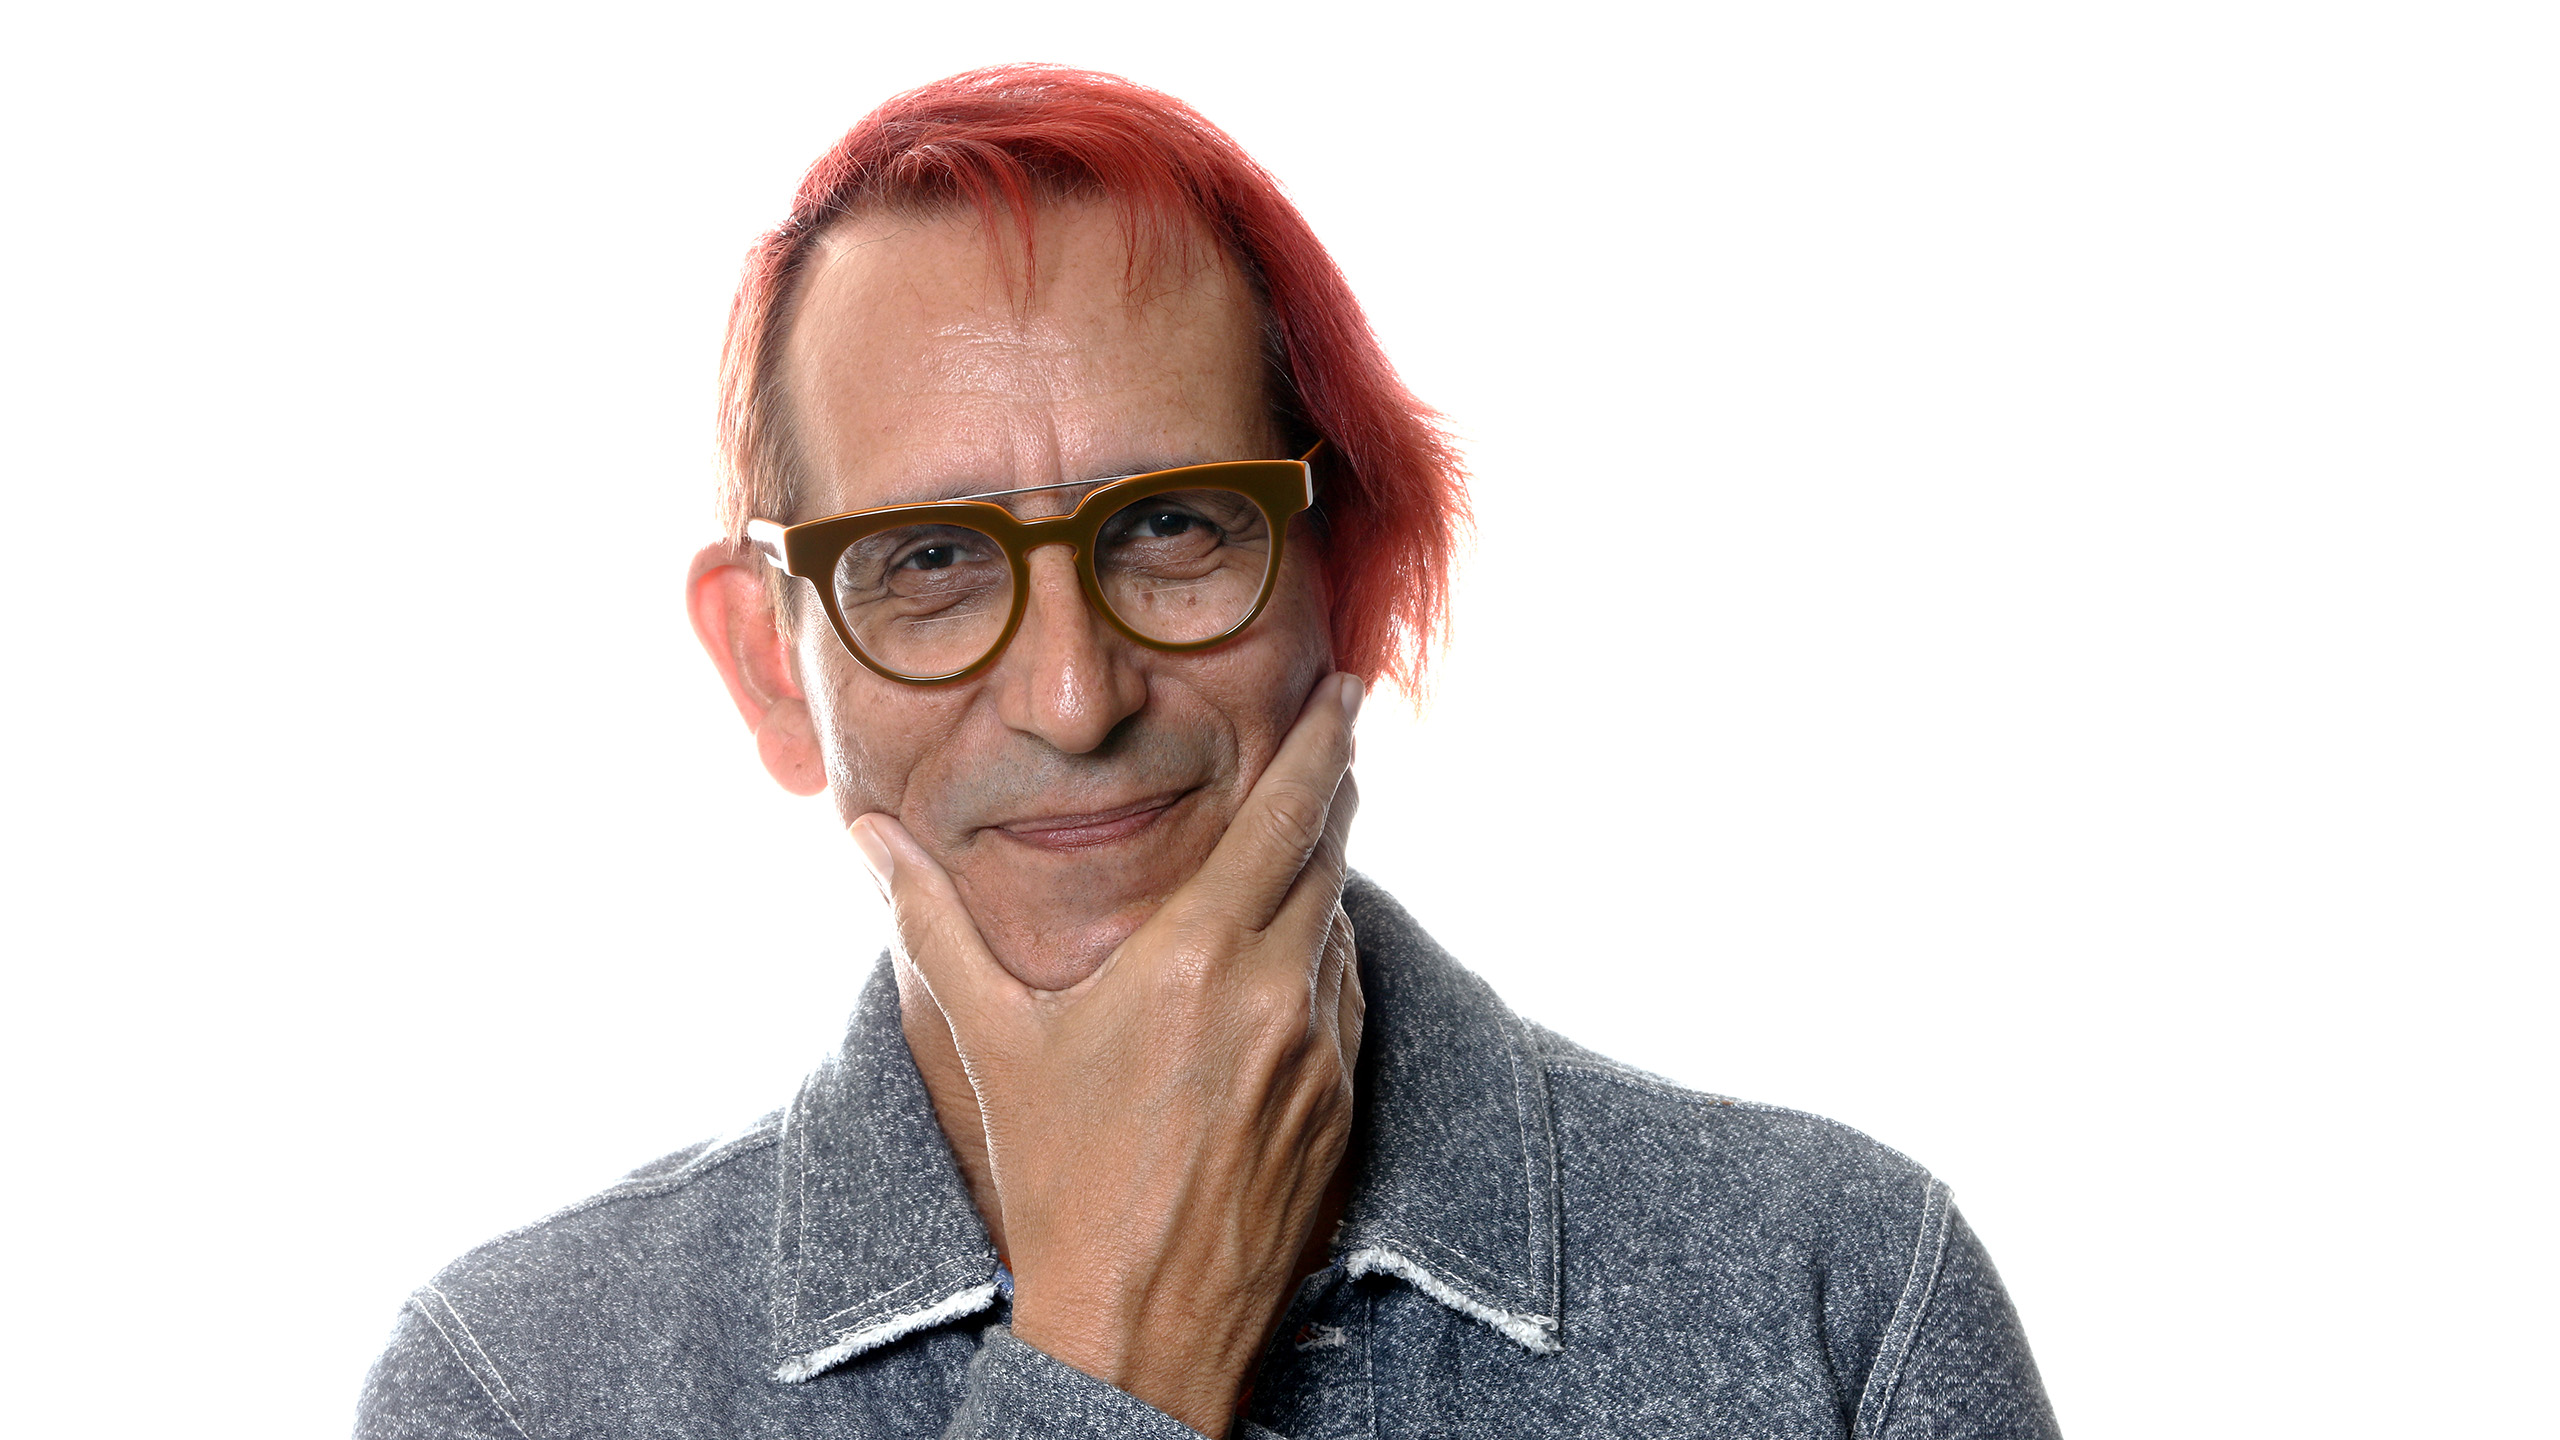 Glenn Zucman in a grey Diesel jacket and wearing SEE Mondo Mondini eyeglasses